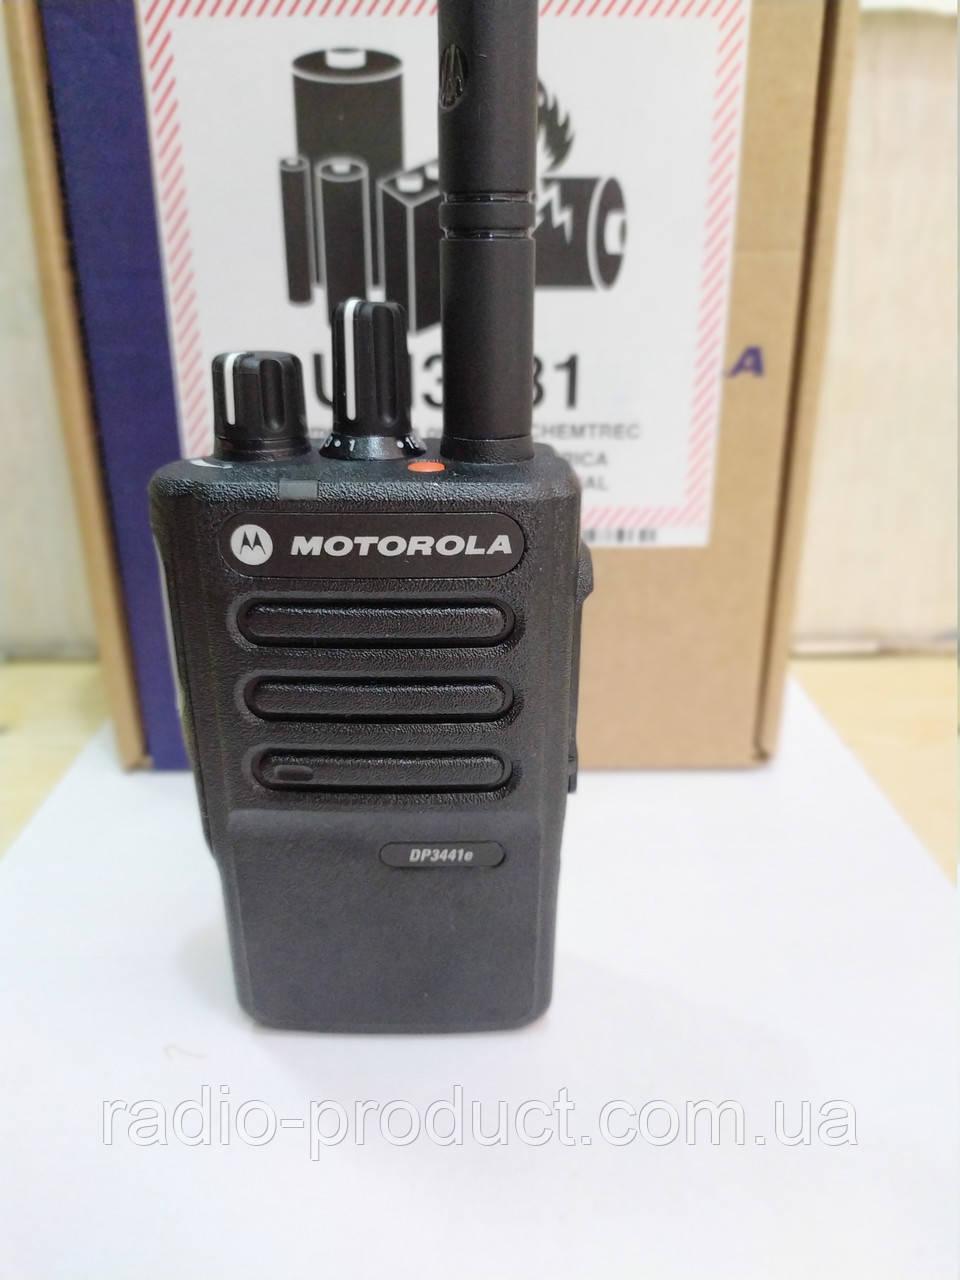 Motorola DP3441E, аналогово-цифровая (DMR) радиостанция UHF диапазона